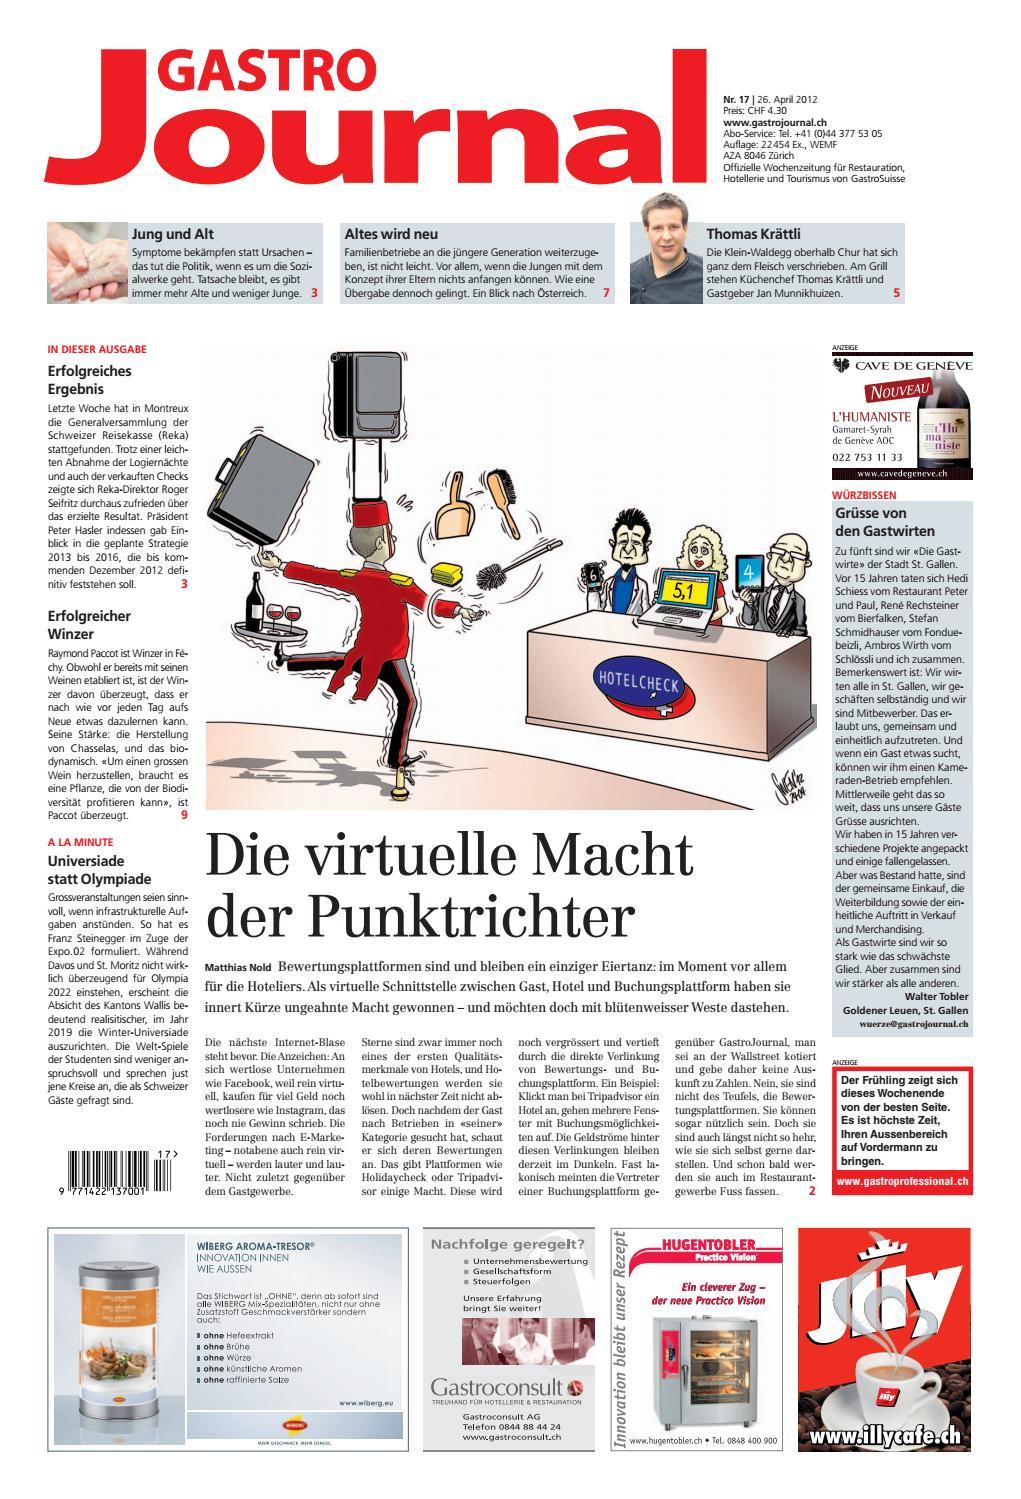 GastroJournal 17 2012 By Gastrojournal